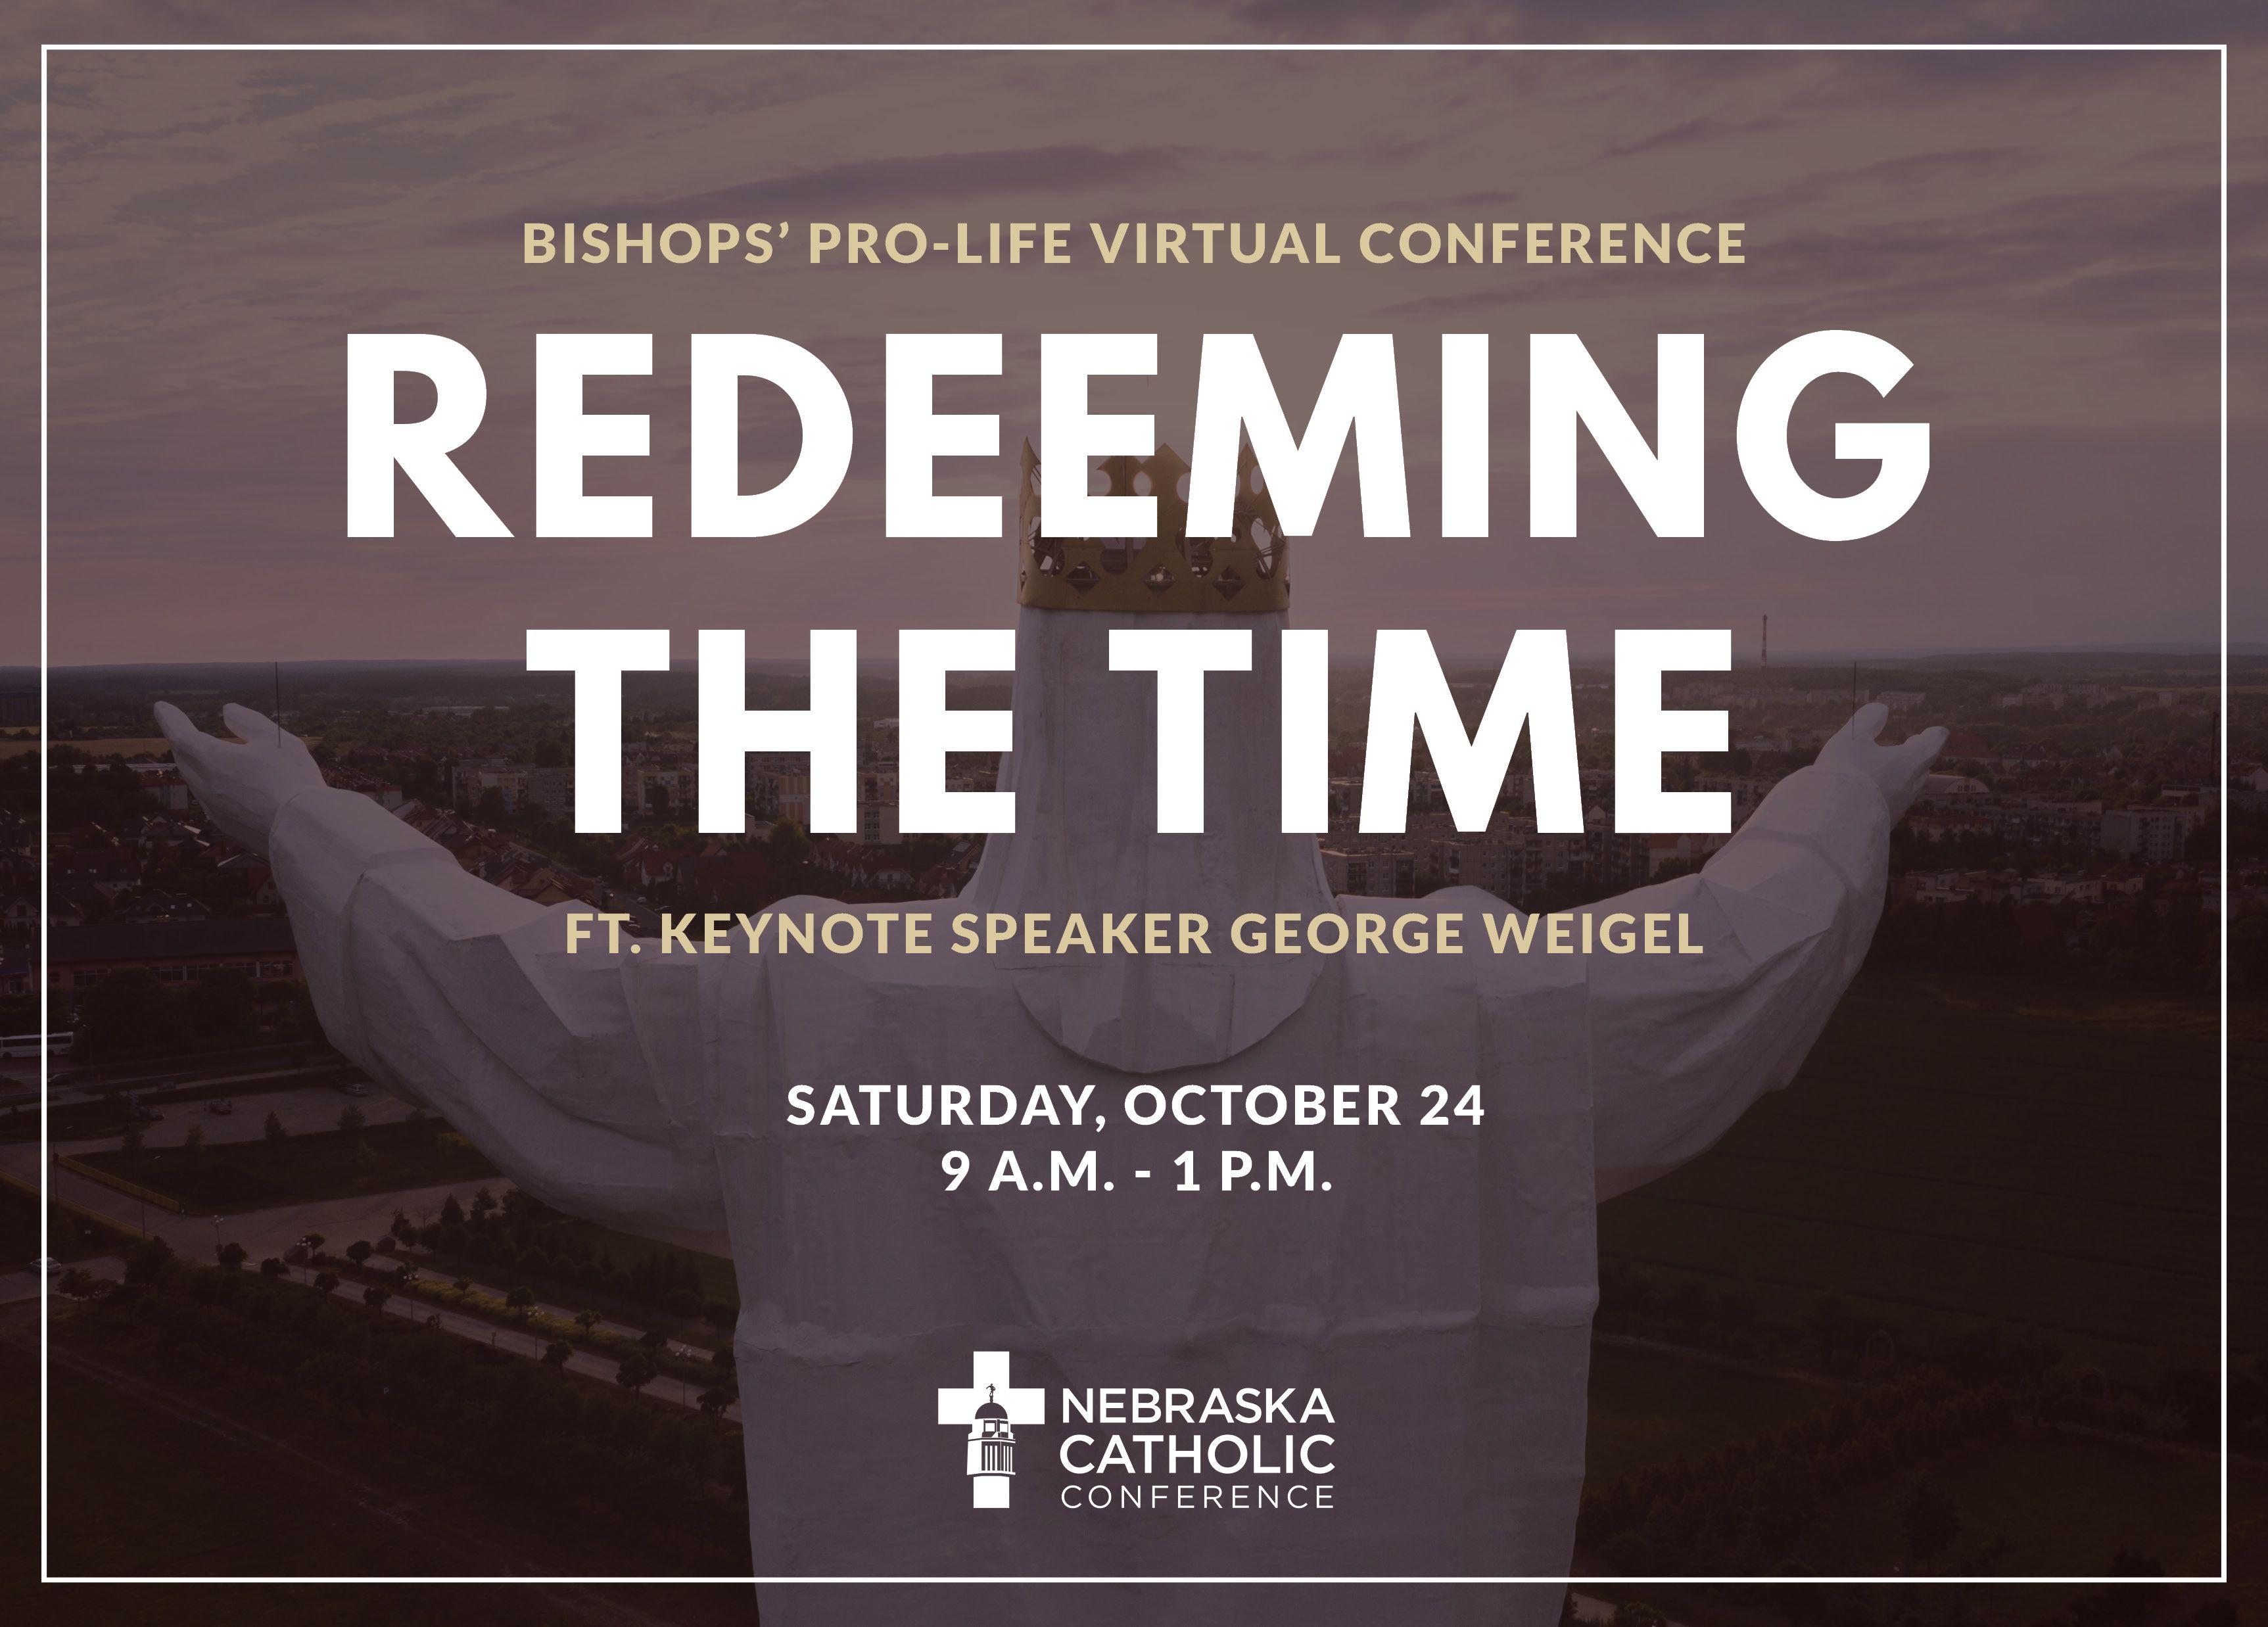 Pro-Life Conference (Virtual)